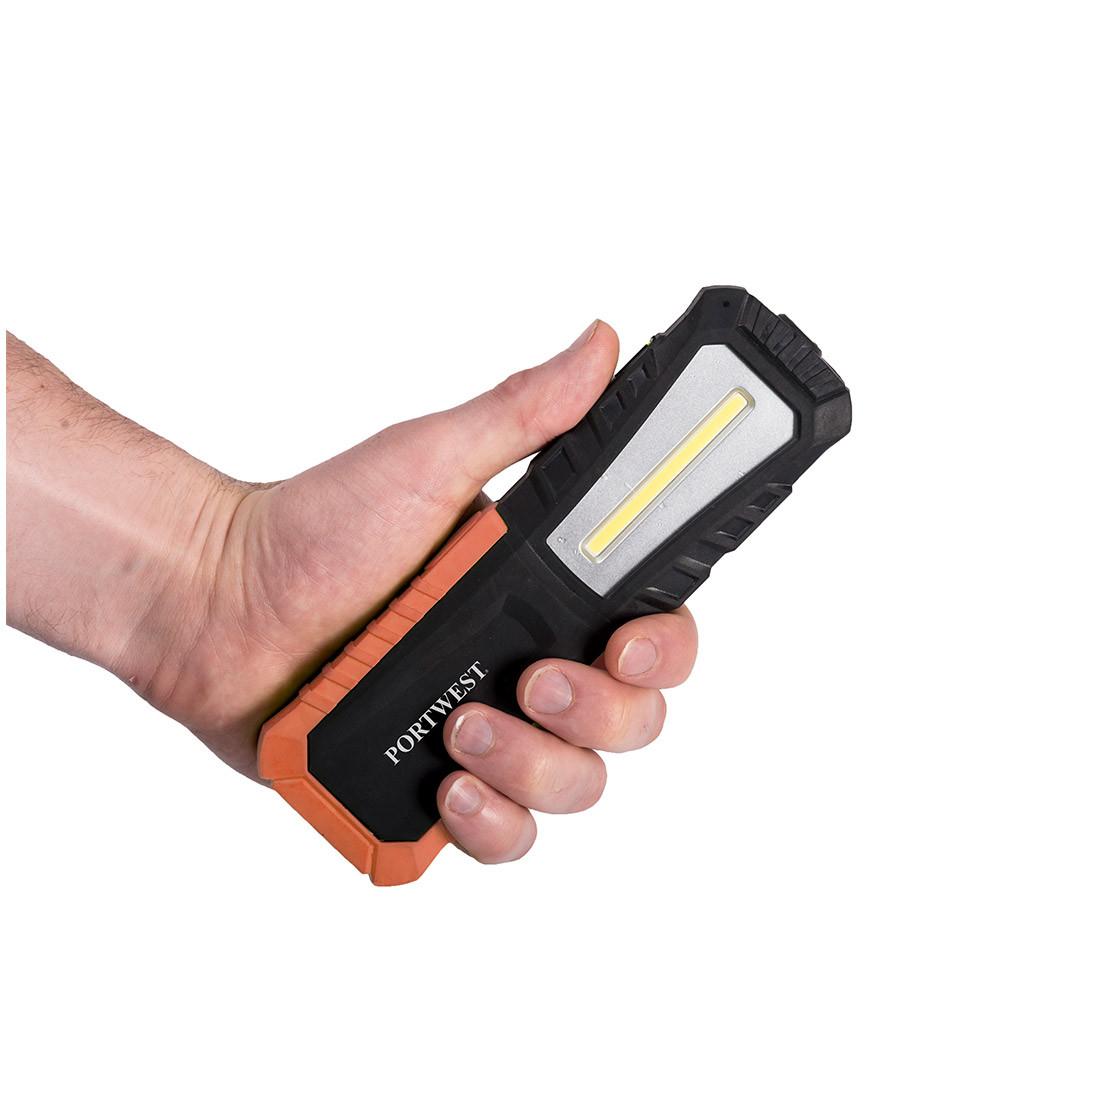 Lanterna USB Rechargeable Inspection - Echipamente Tehnice